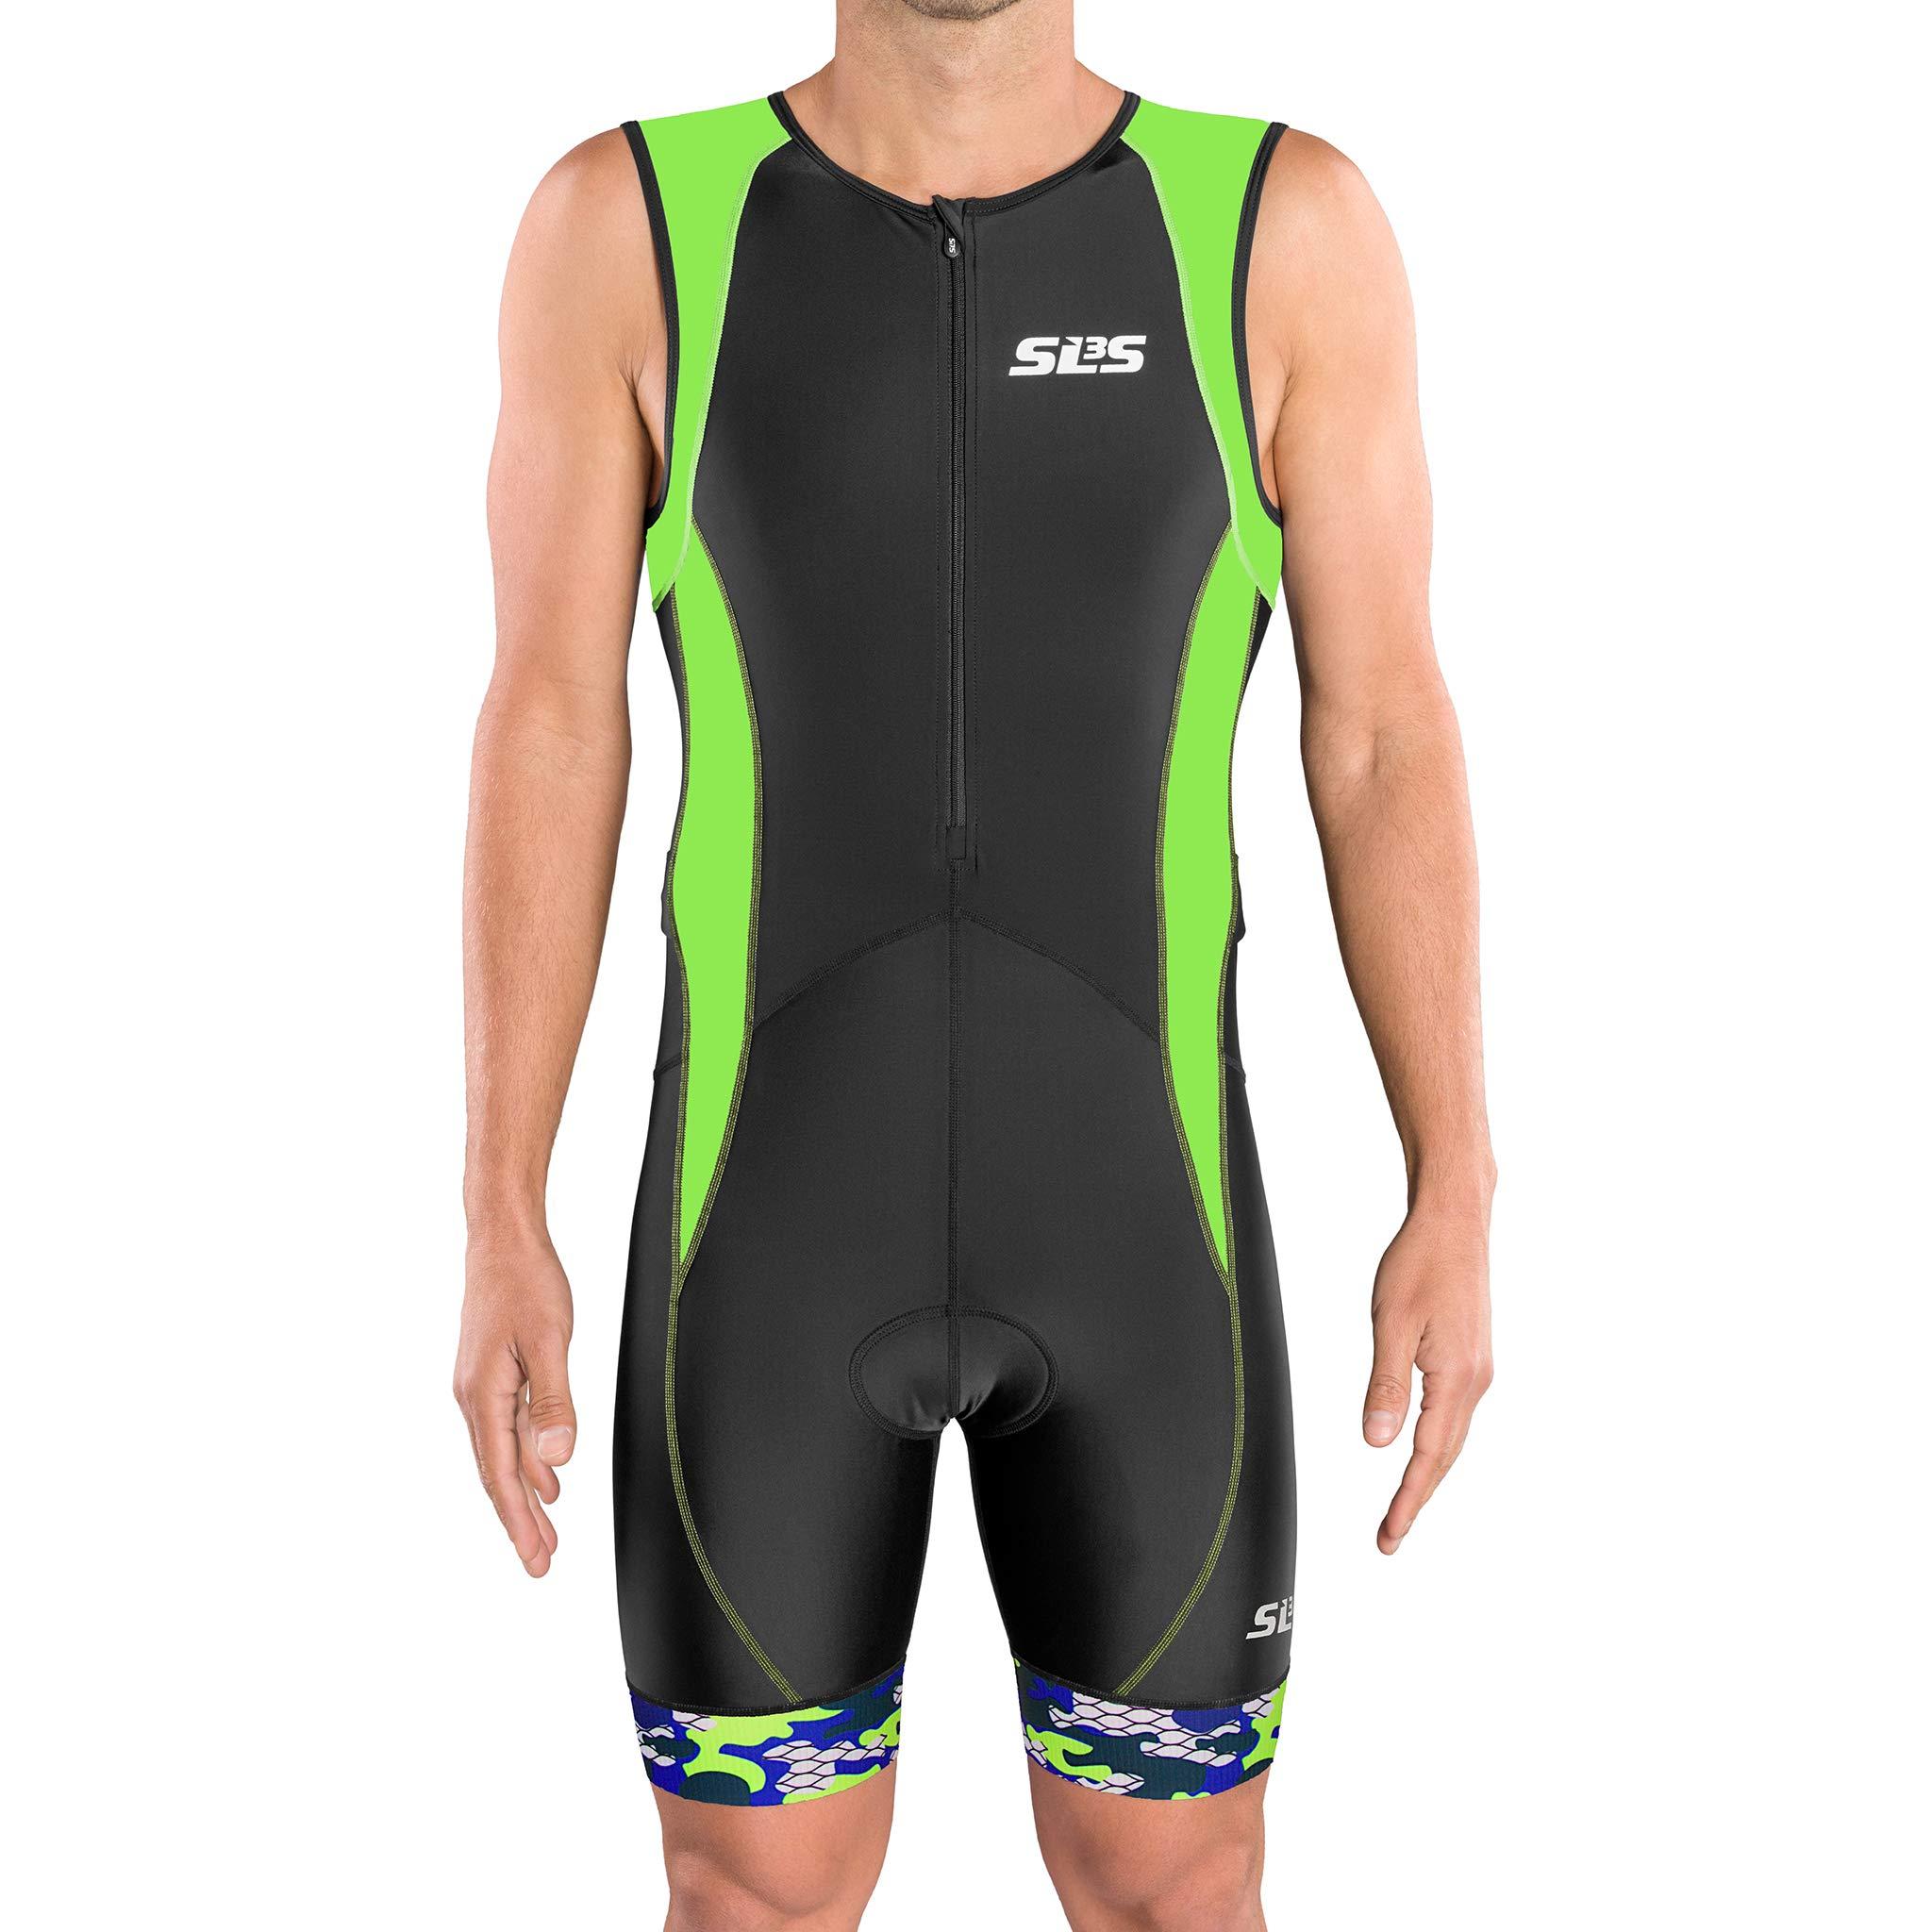 SLS3 Men`s Triathlon Tri Suit FX | Trisuit | 2 Pockets | Soft Custom Chamois | German Designed (Black/Green, S)